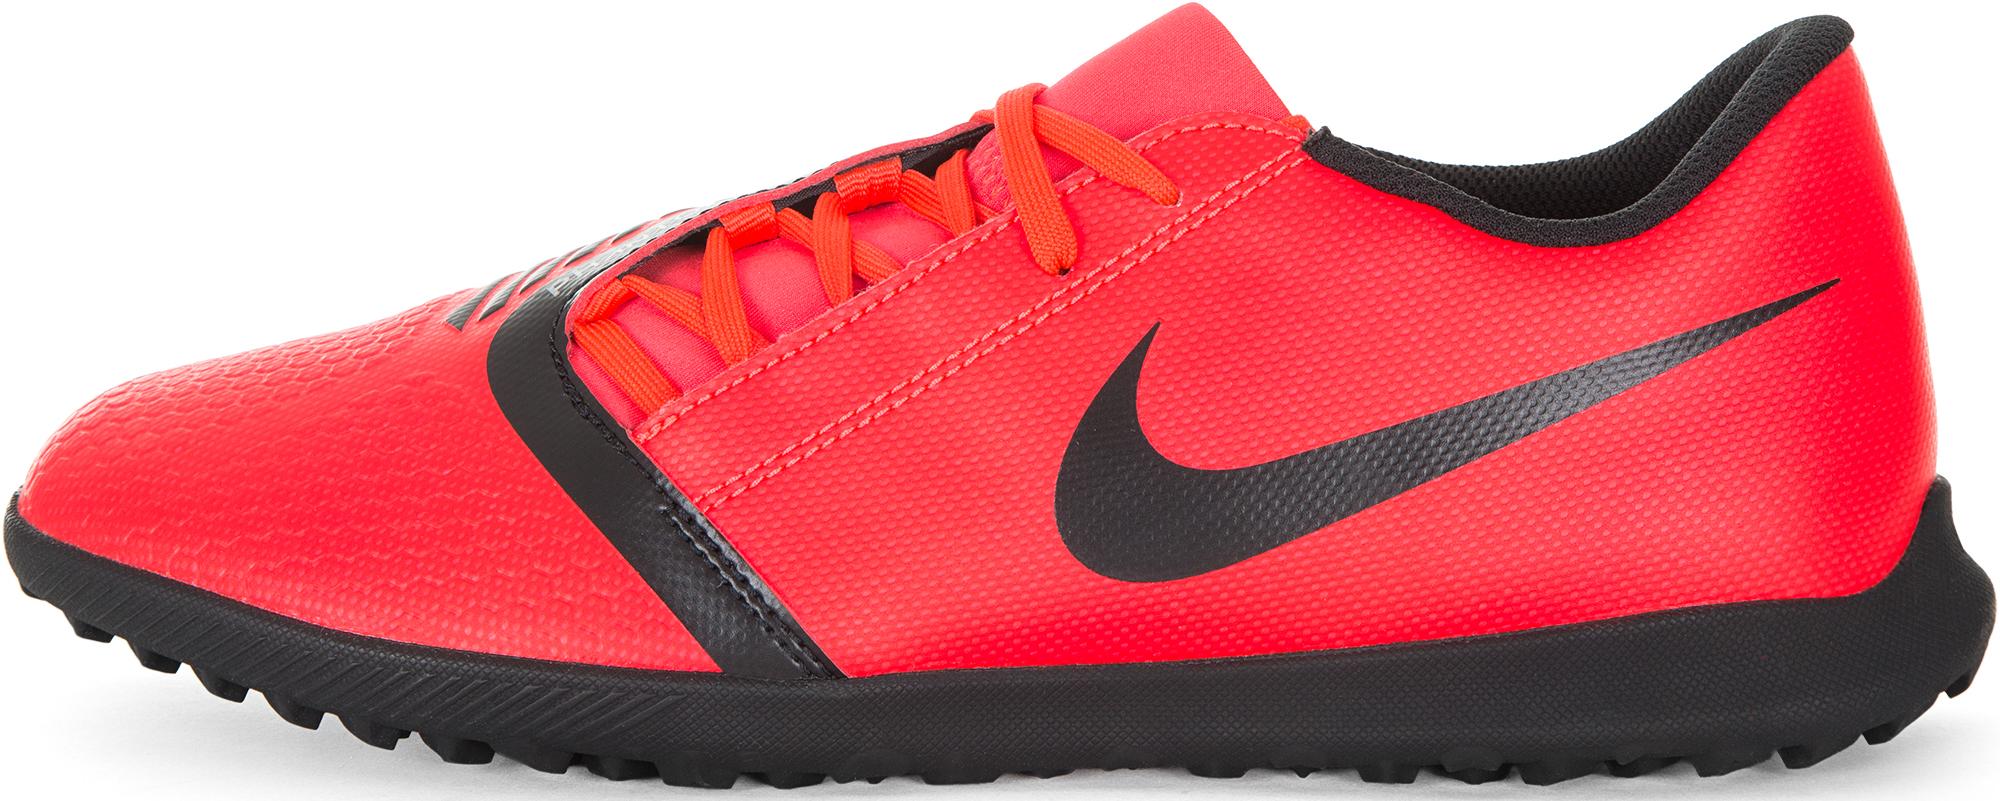 Nike Бутсы мужские Nike Phantom Venom Club TF, размер 41 цена